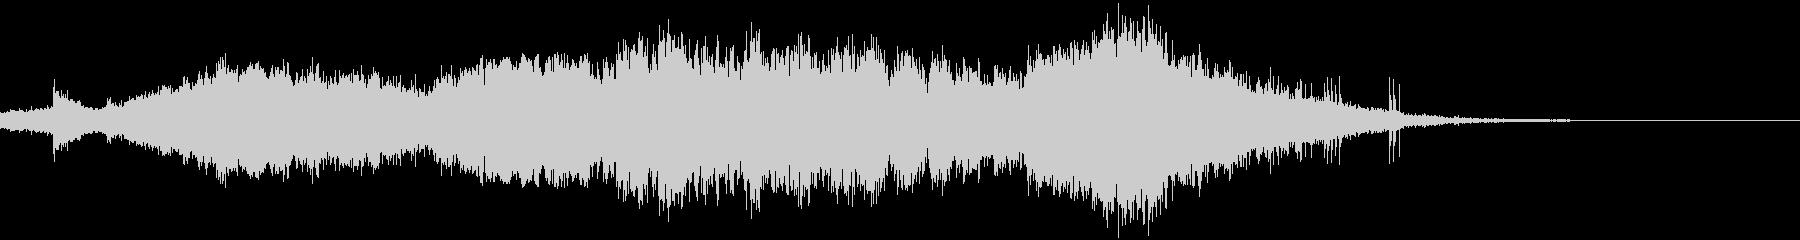 【SFX】グリッチSE_09 エラーの未再生の波形